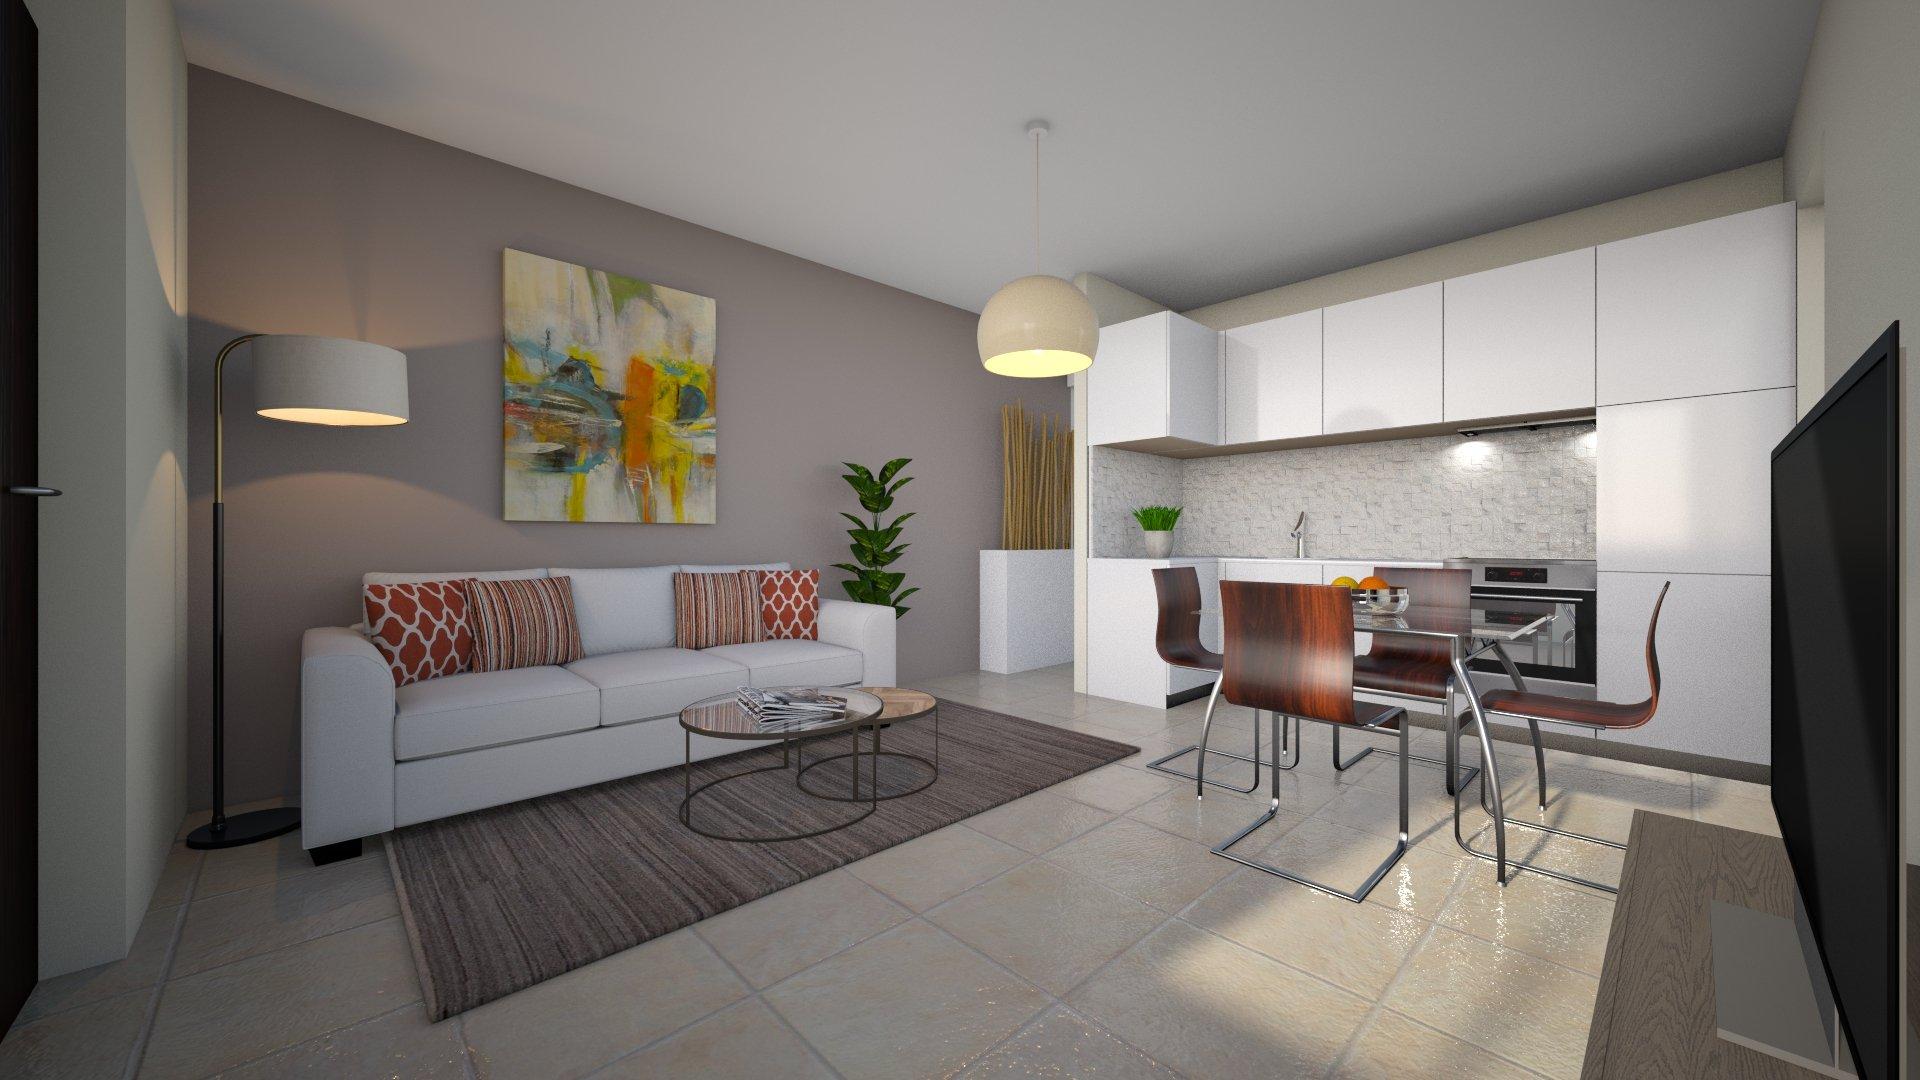 Appartamento in villa in vendita a Magnago